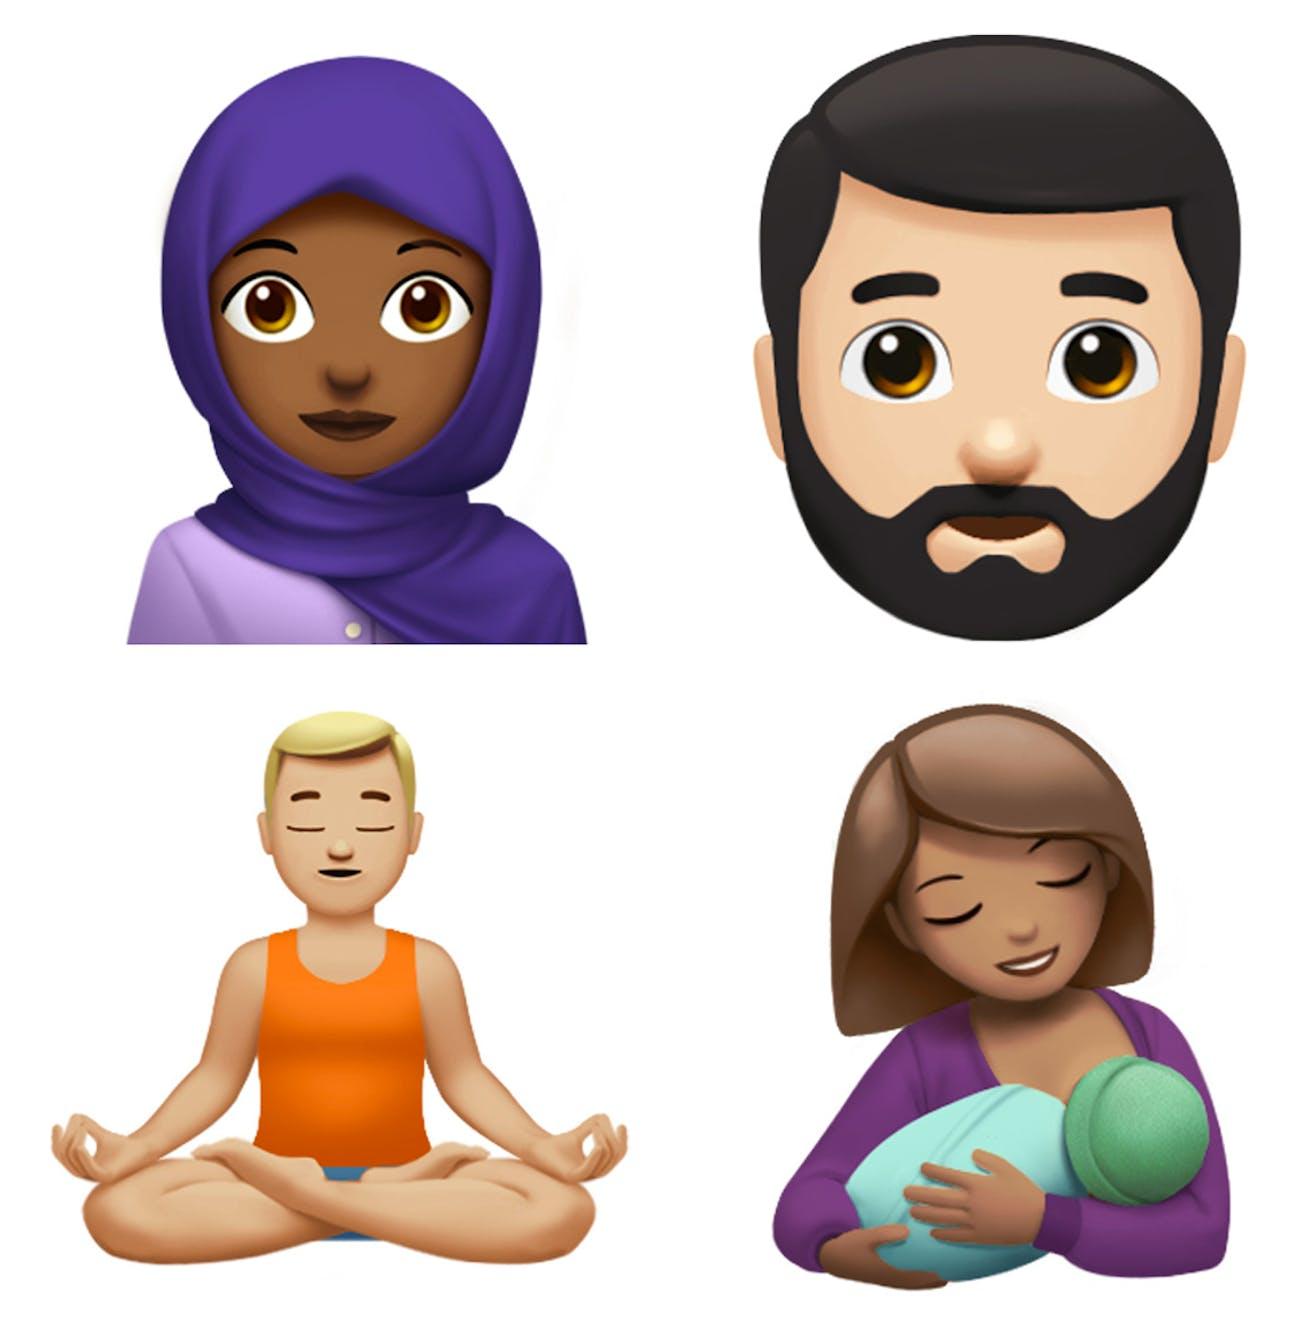 Four new human emojis.